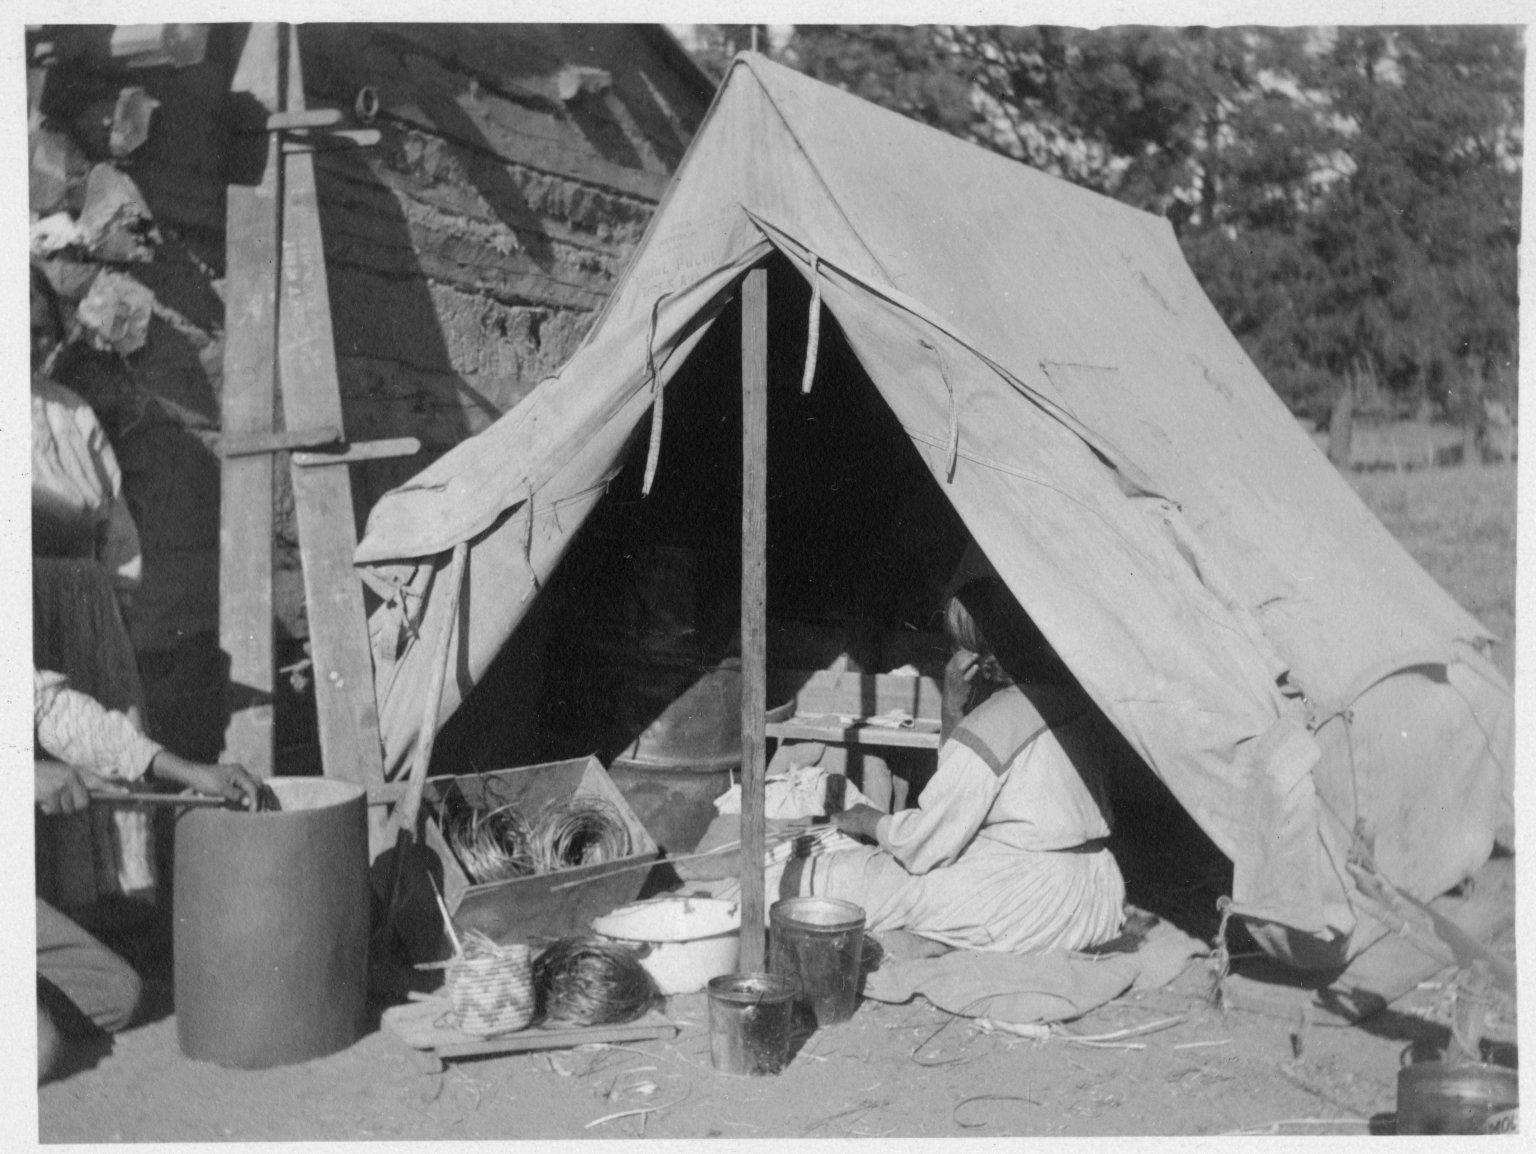 Tent next to log house, basketmaking in progress.